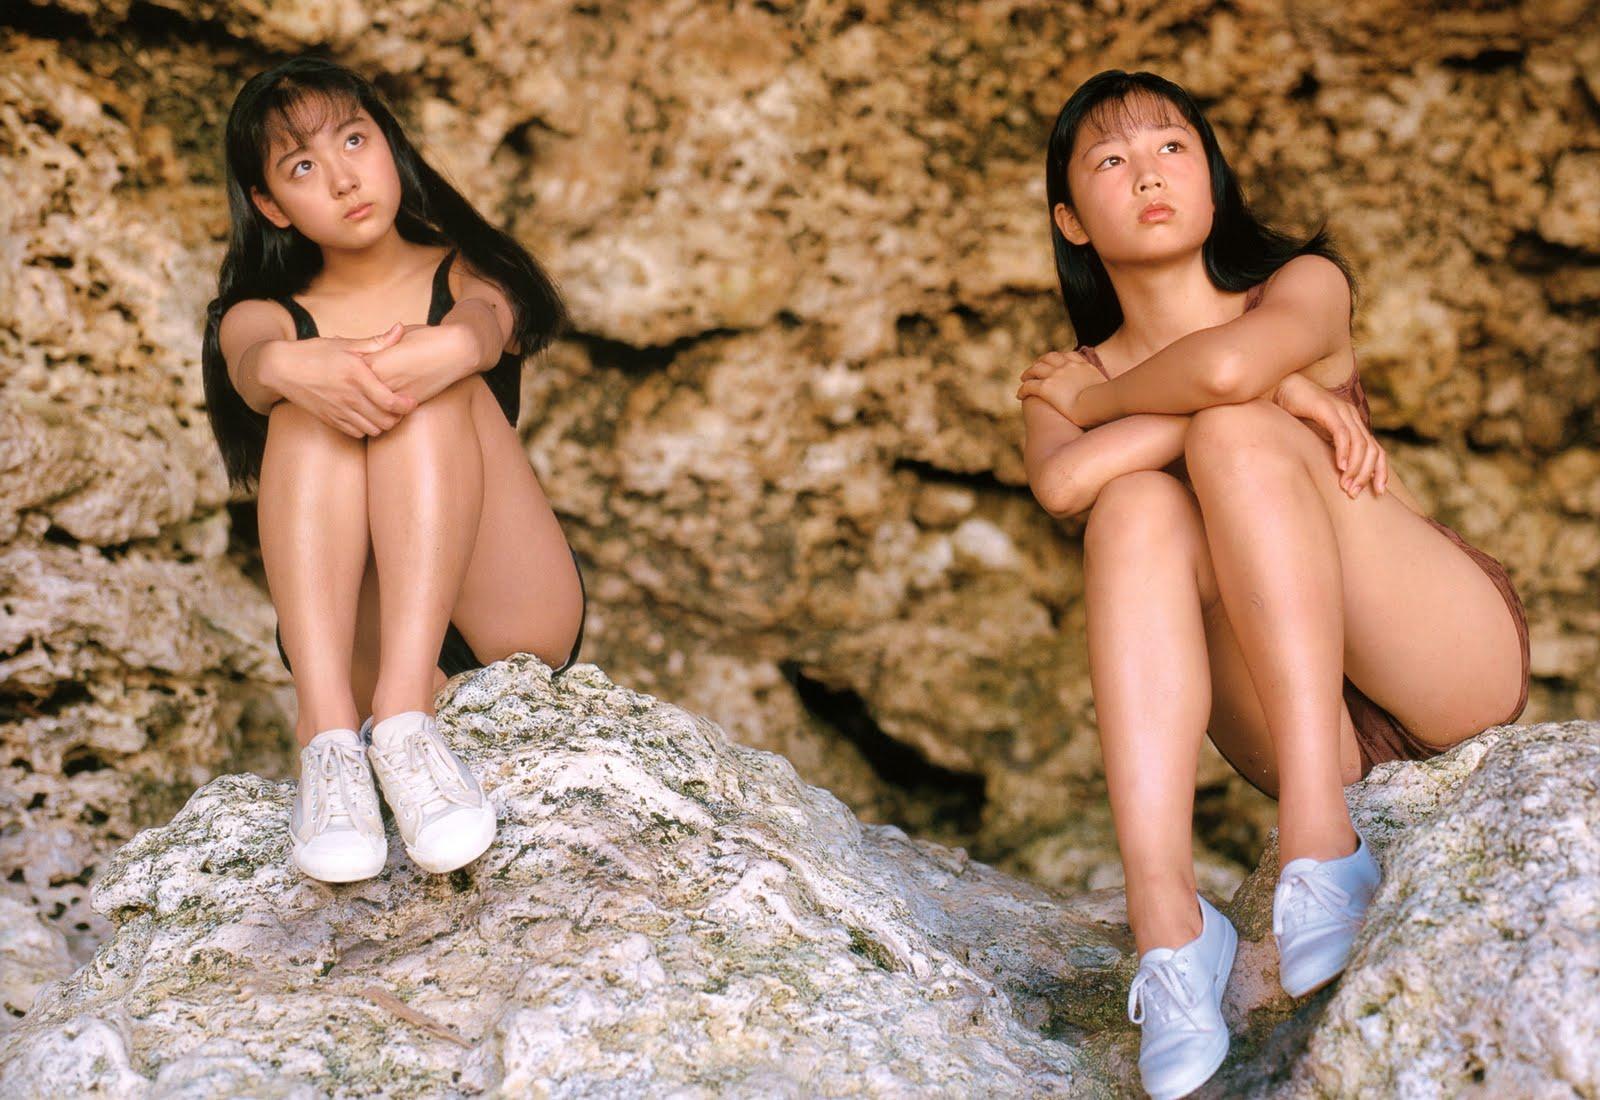 yoko mitsuya and saori nara sexy swimsuit teens photos 04